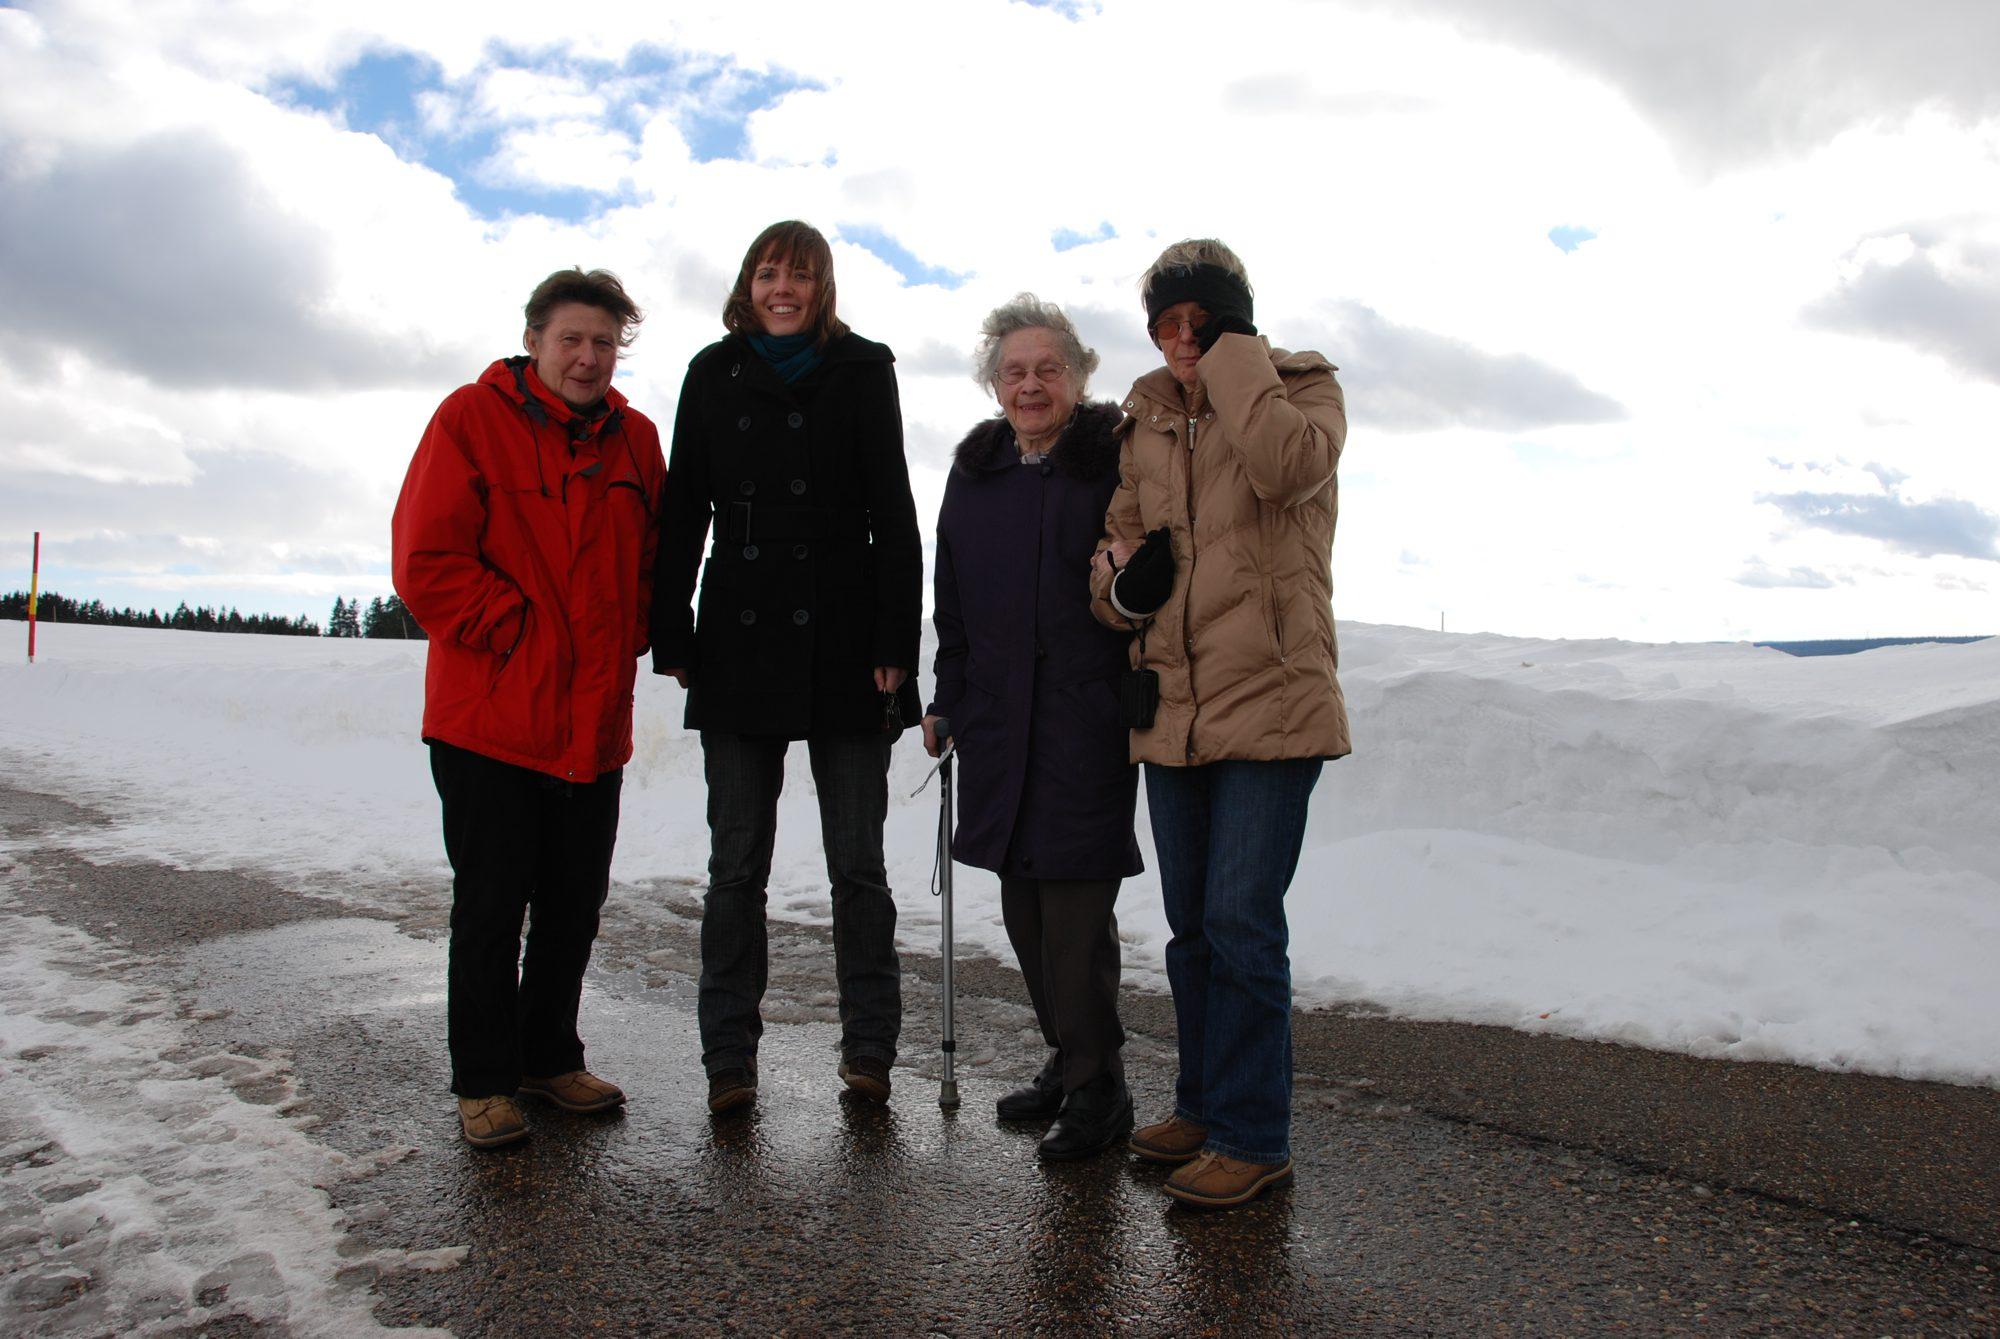 2010 - Generations. Rita, Luisa, Oma und Mama.